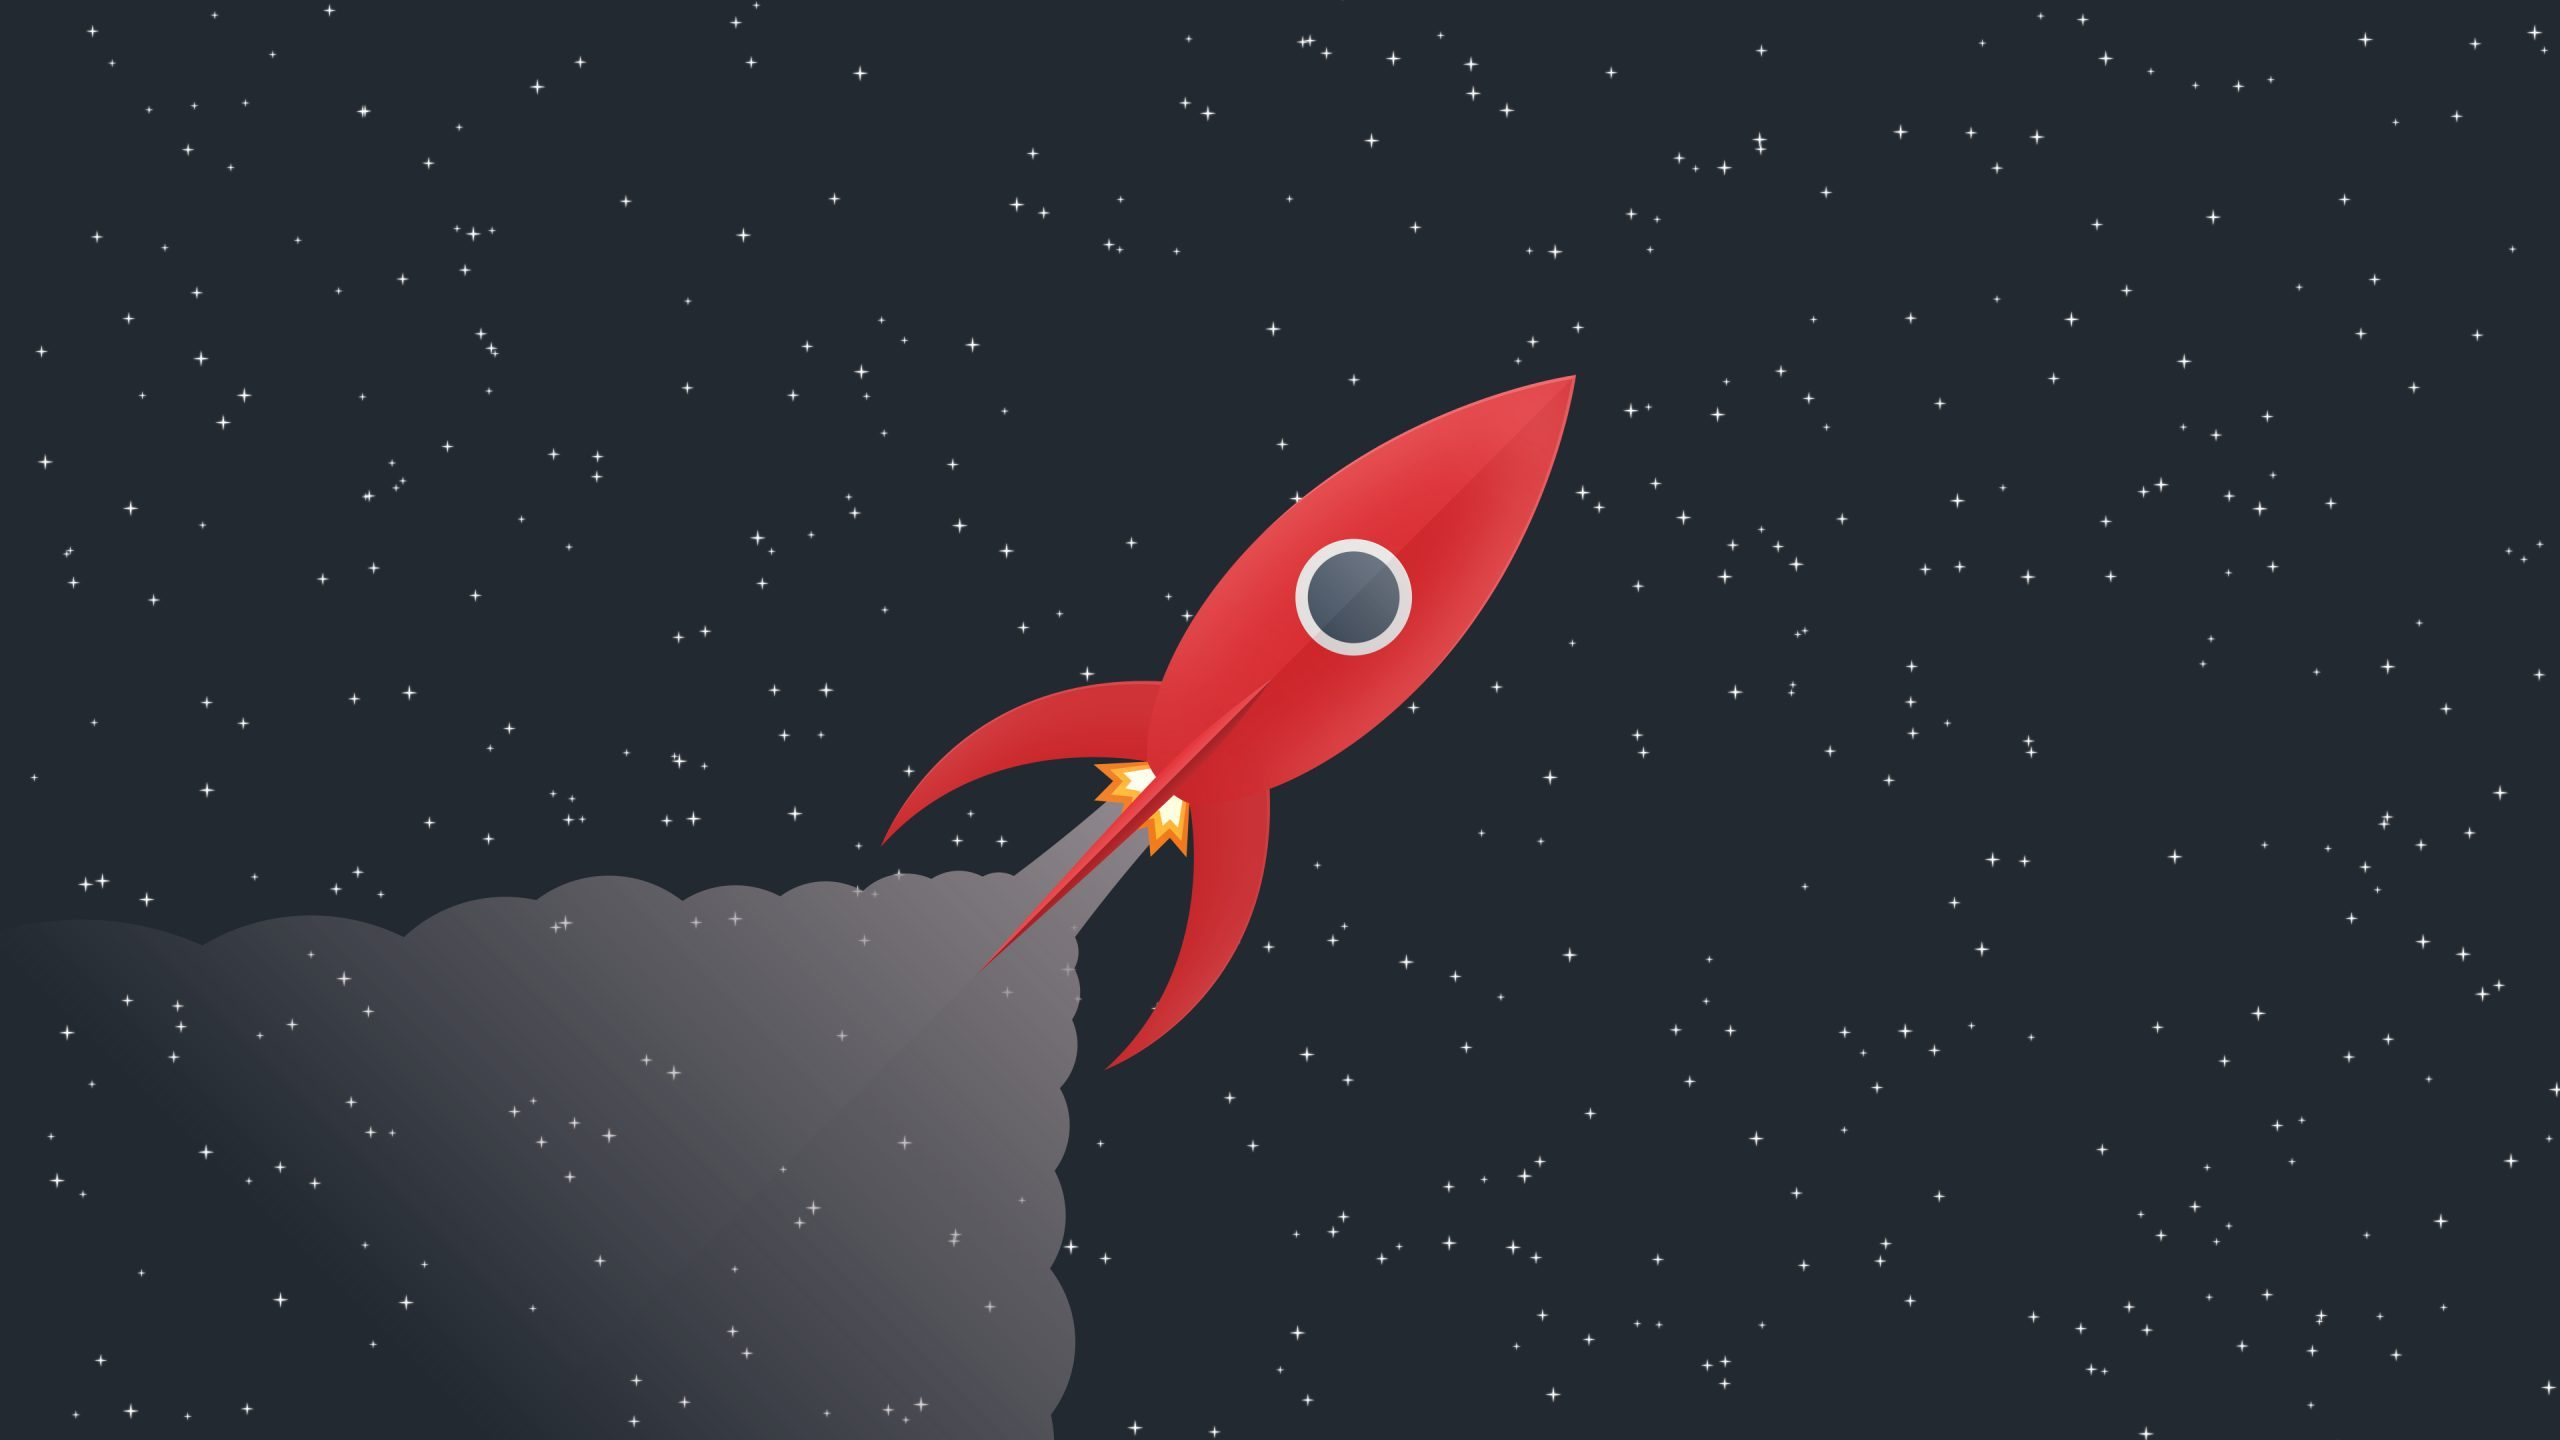 minimal-rocket-in-space_64137_3840x2160-2408556